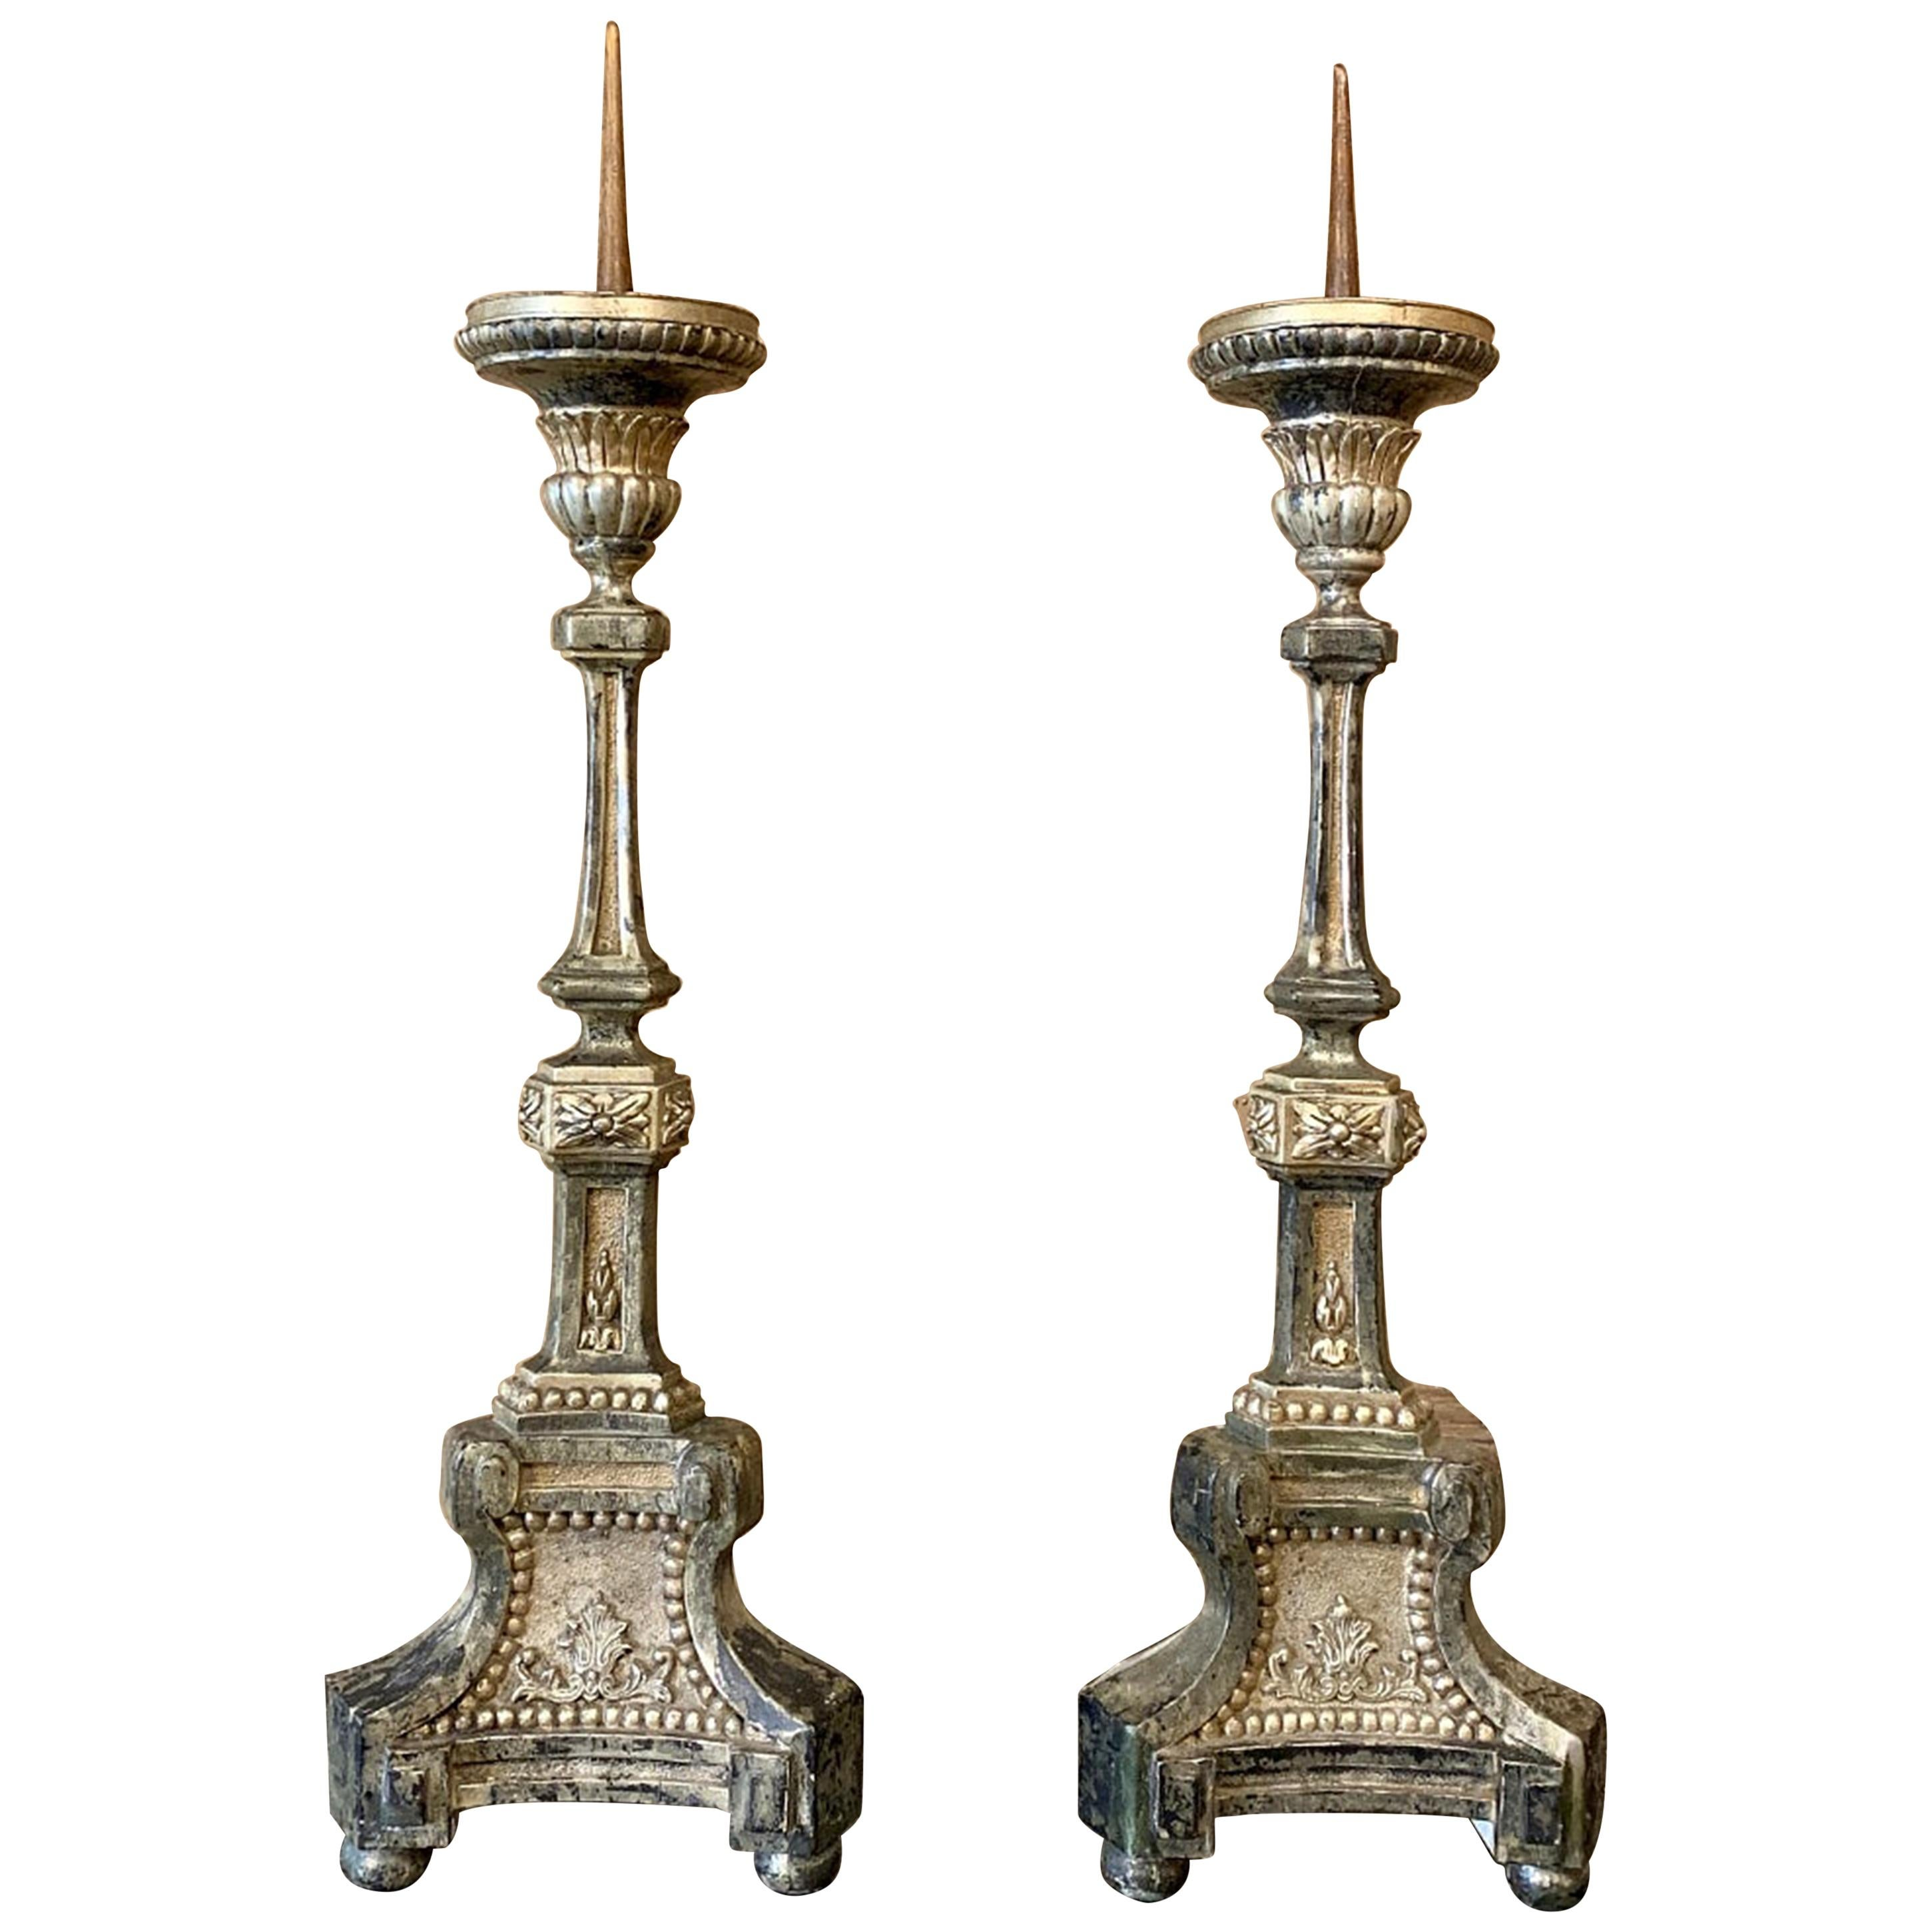 Pair of Candlesticks, 18th Century Italian Neoclassical Polychrome